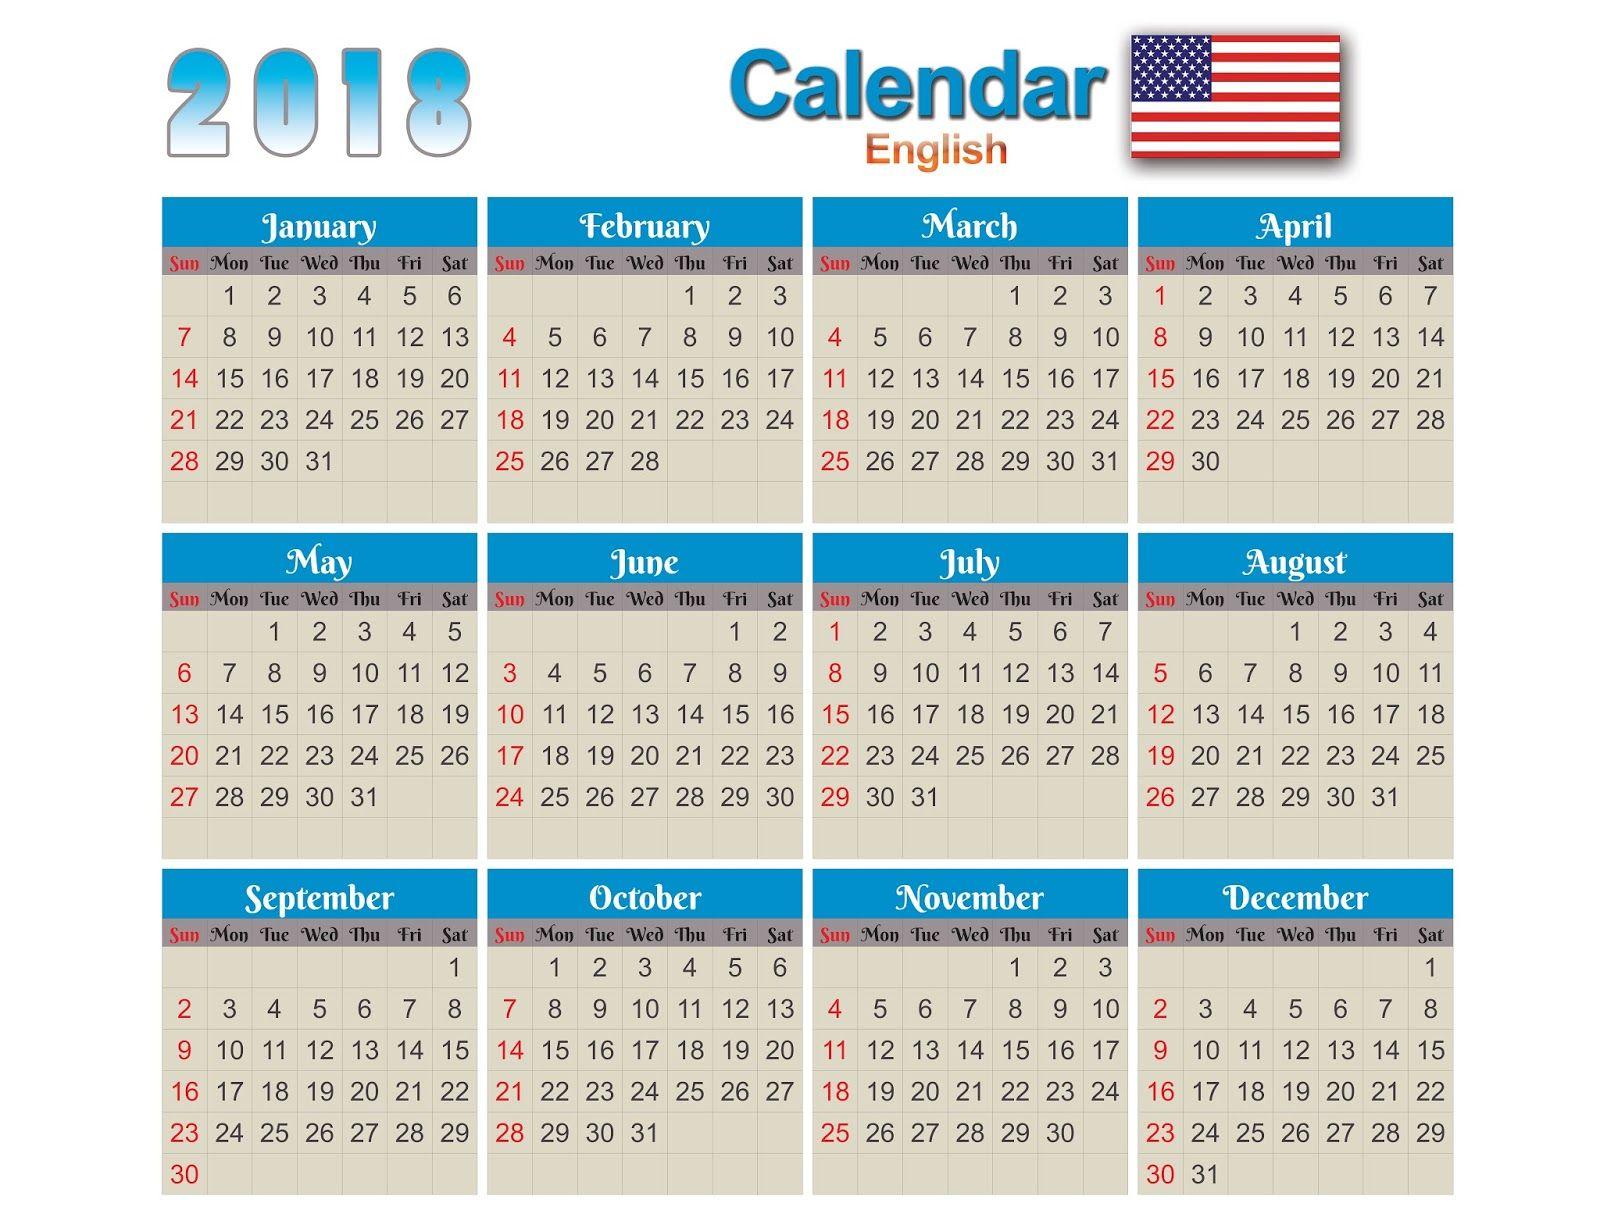 Calendars 2018 English Eps,Ai,Cdr,PSD,PNG e PDF Vector Calendar 2018 English free Download